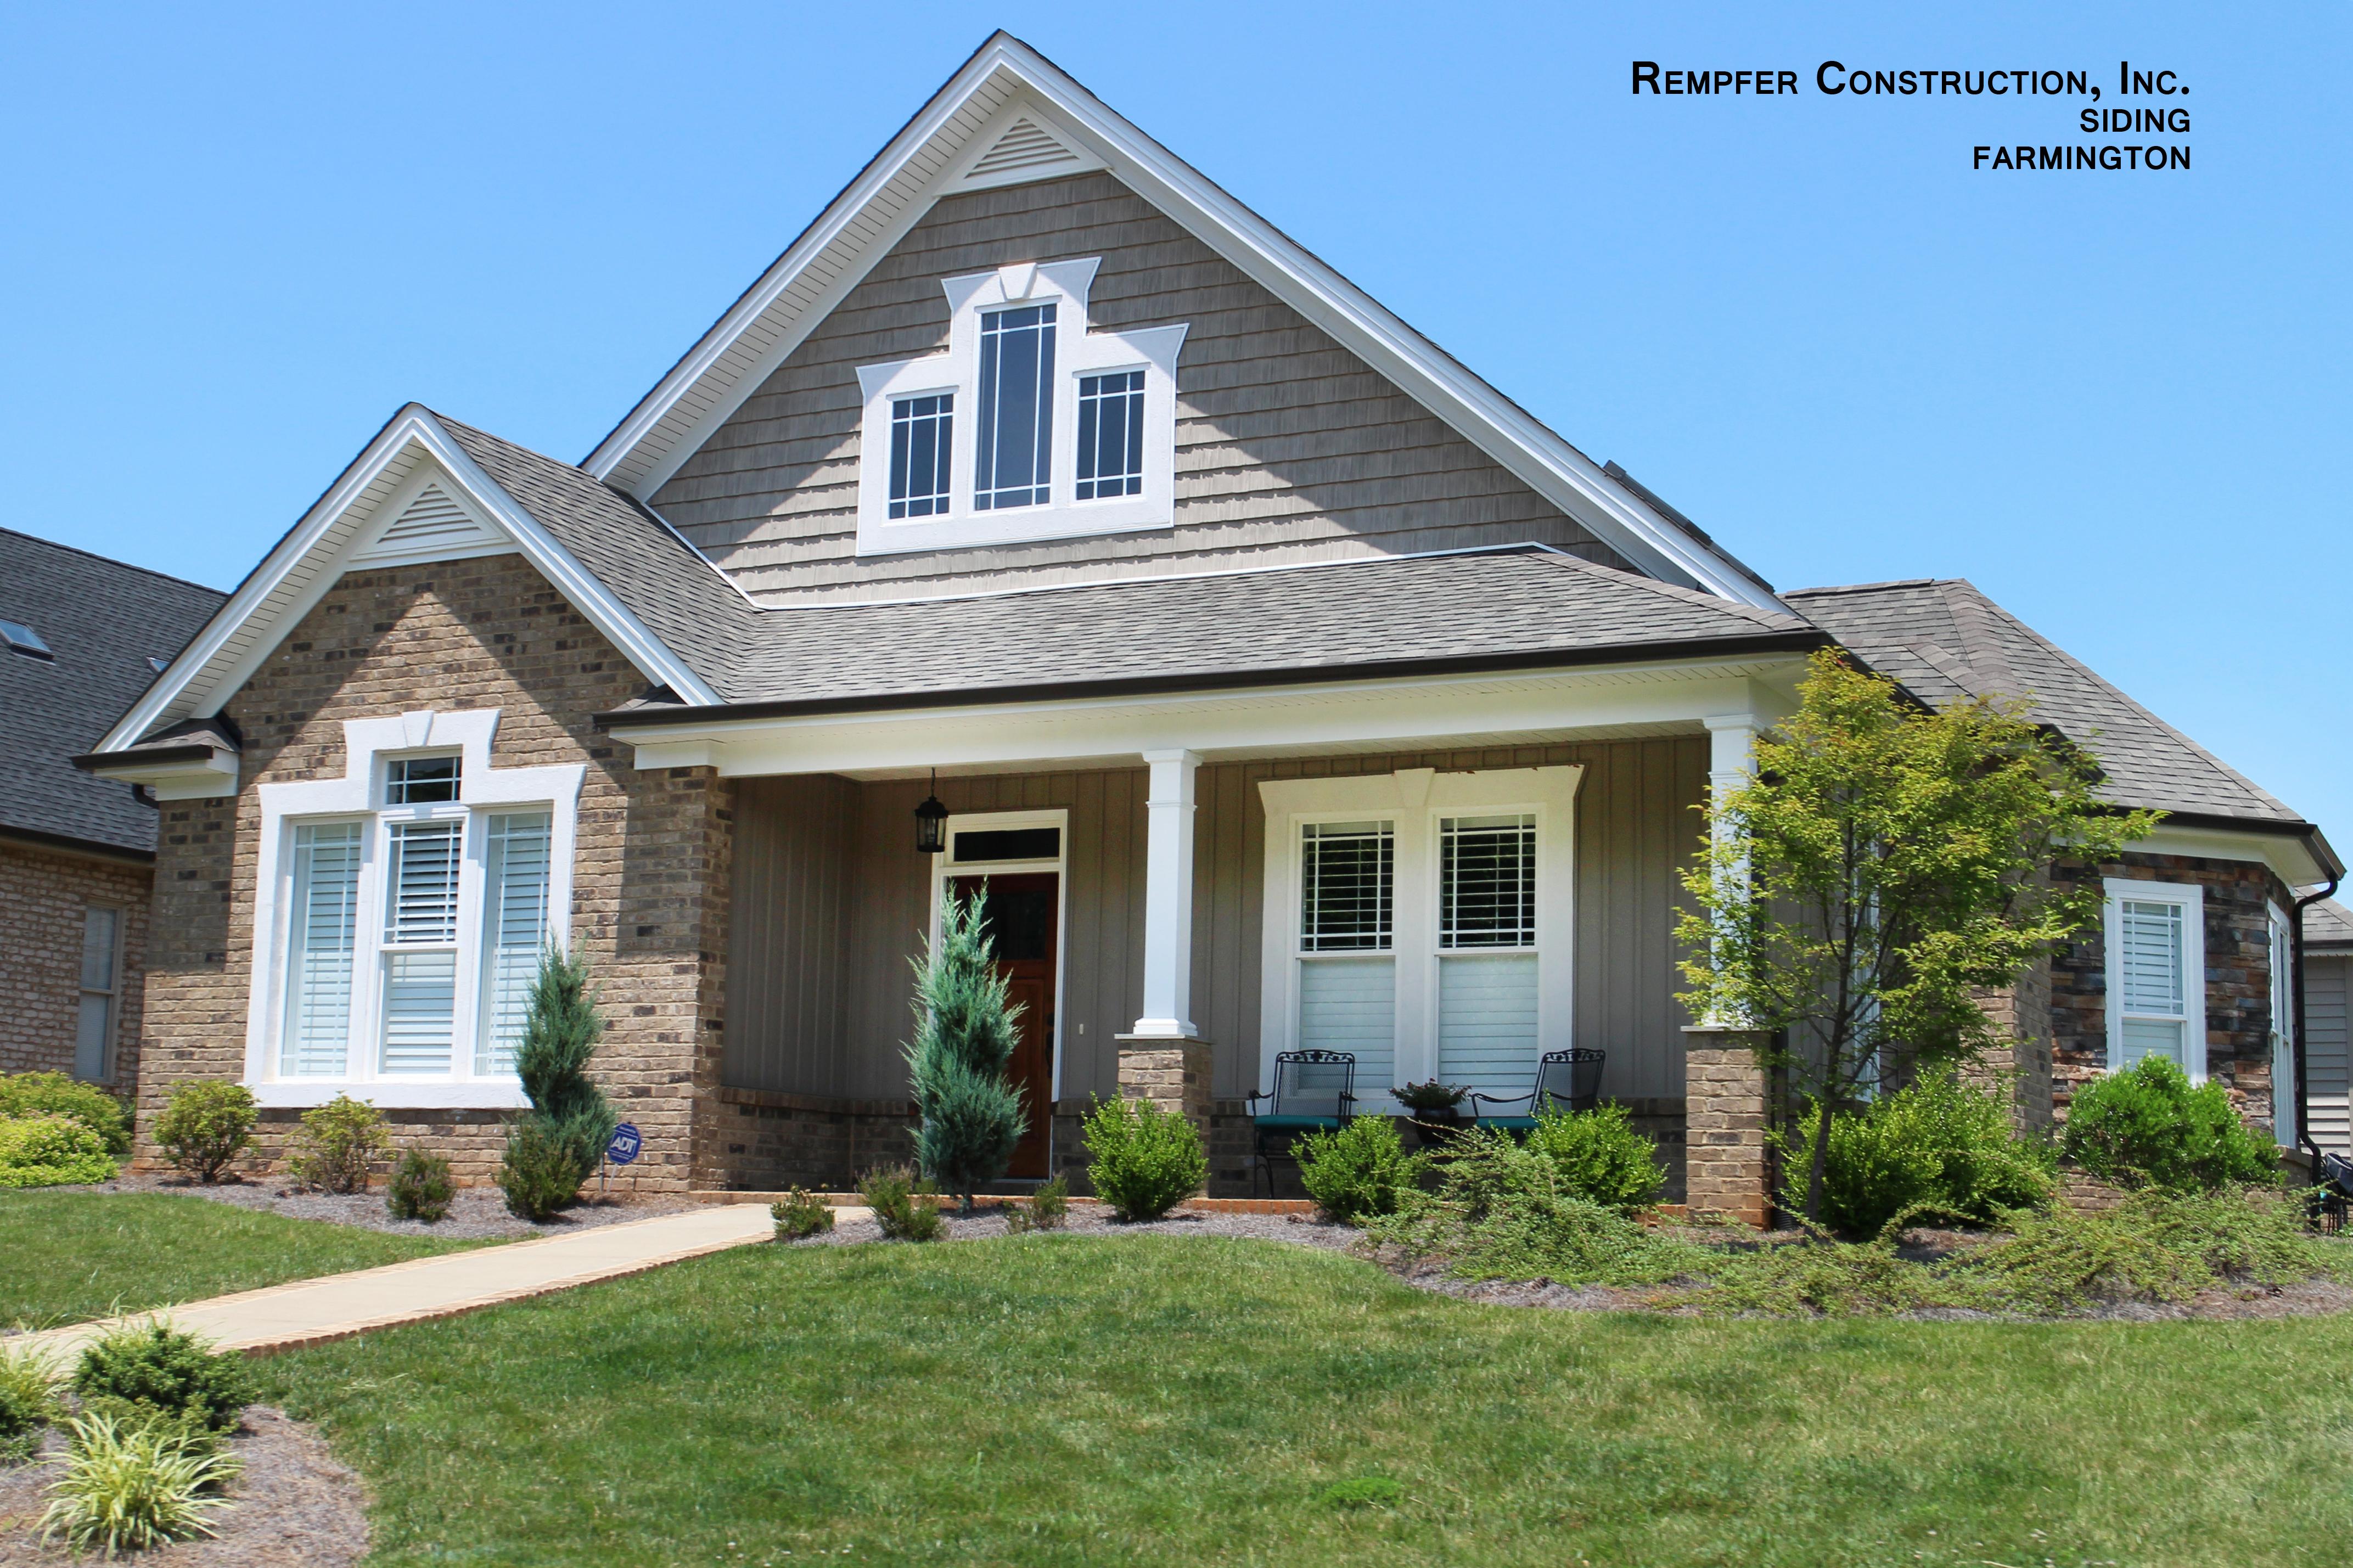 Residential Rempfer Construction Inc Lynchburg